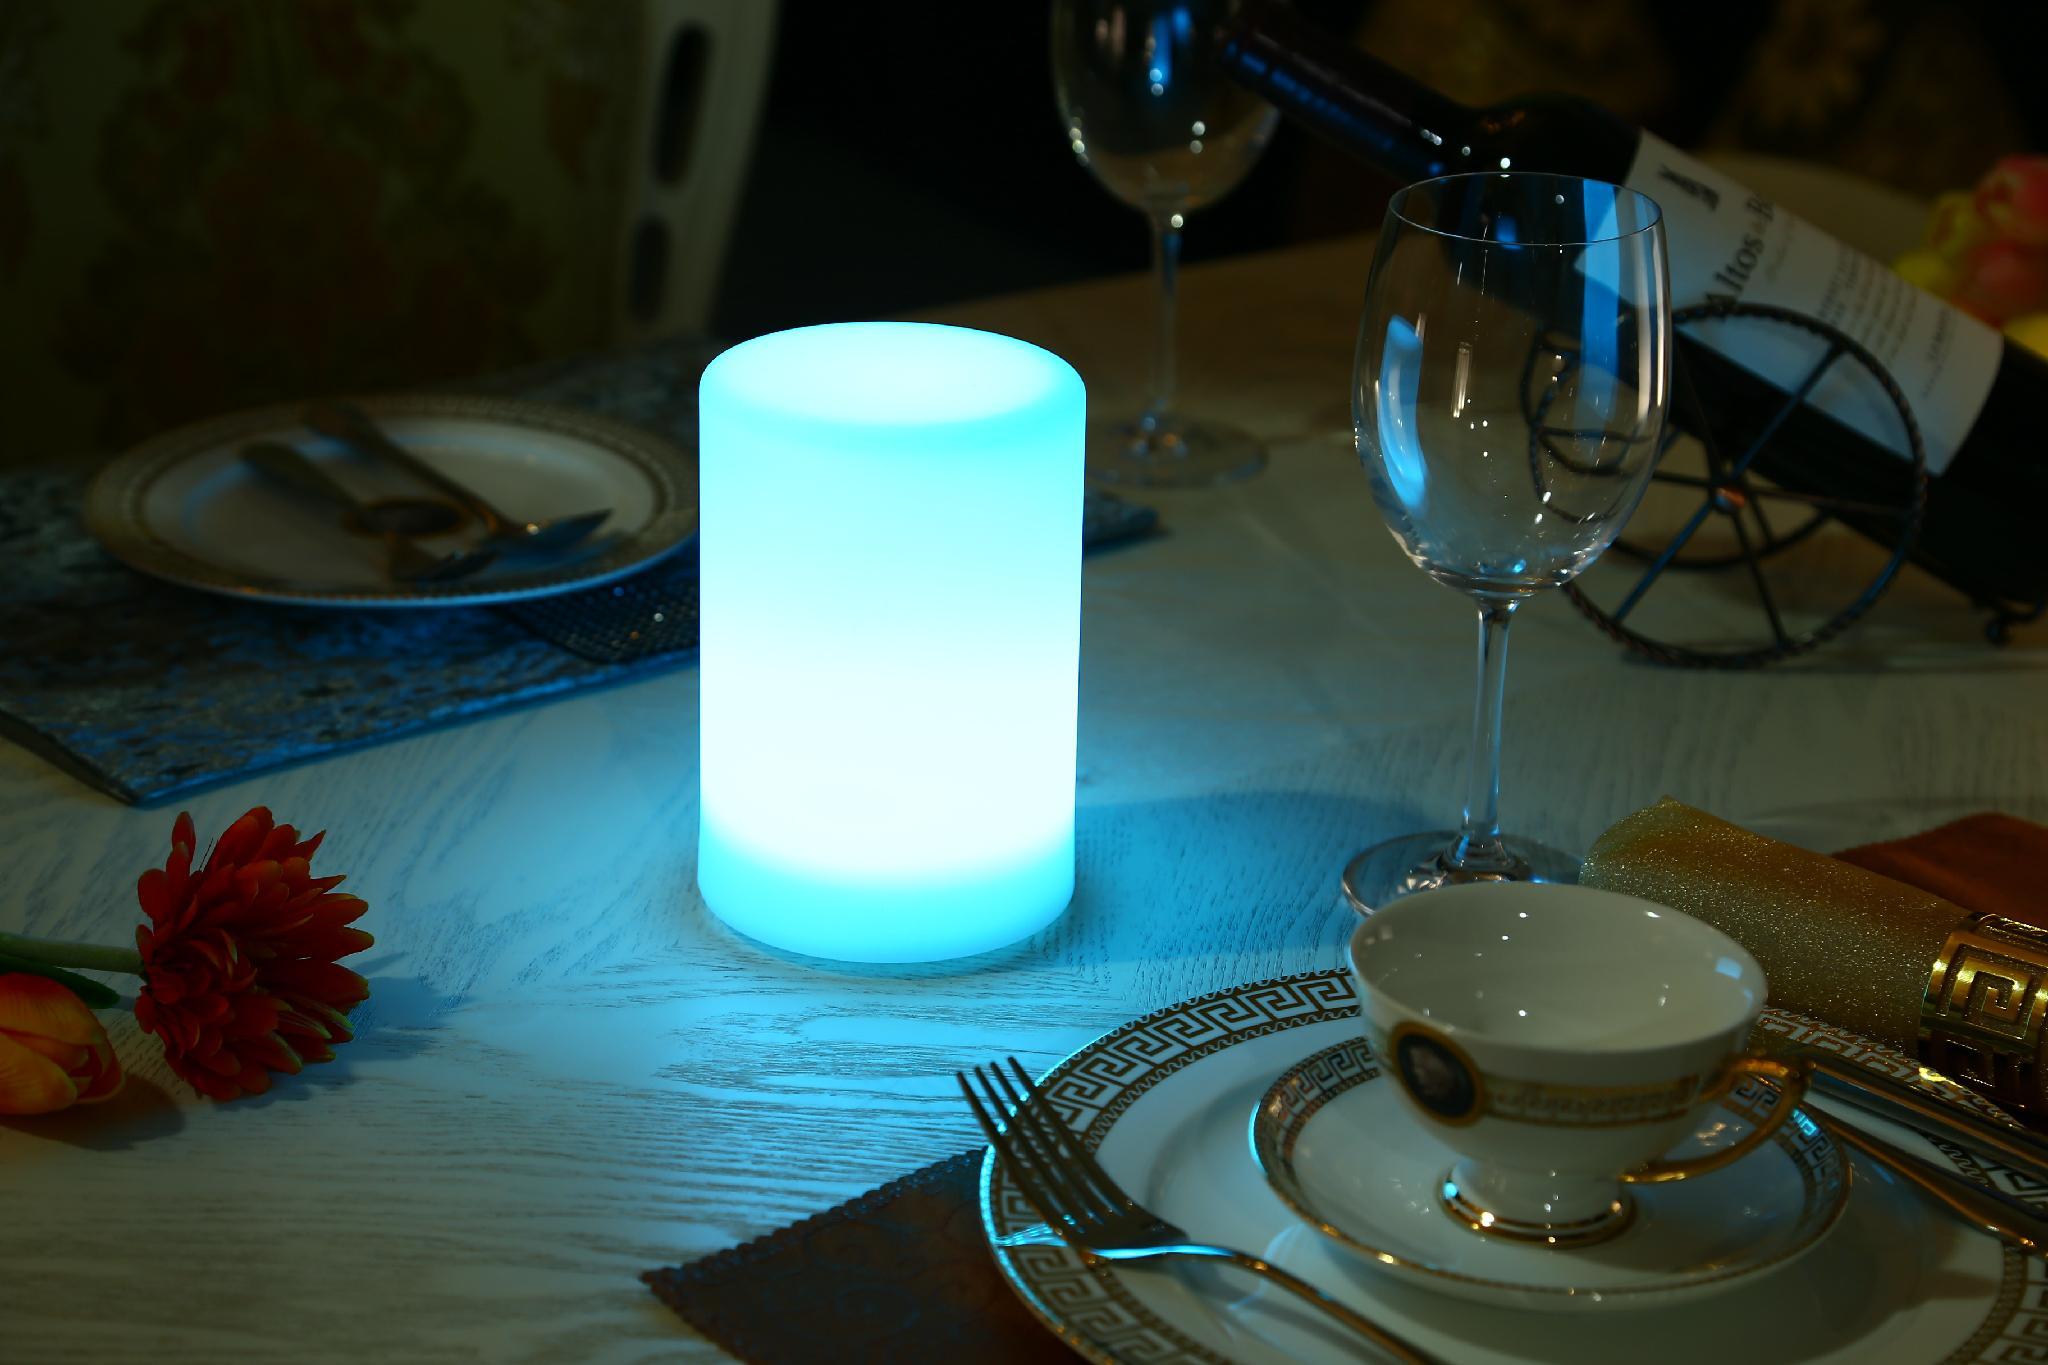 Induction rechargeable led table lamp mp 06 al megapower china induction rechargeable led table lamp 3 aloadofball Choice Image